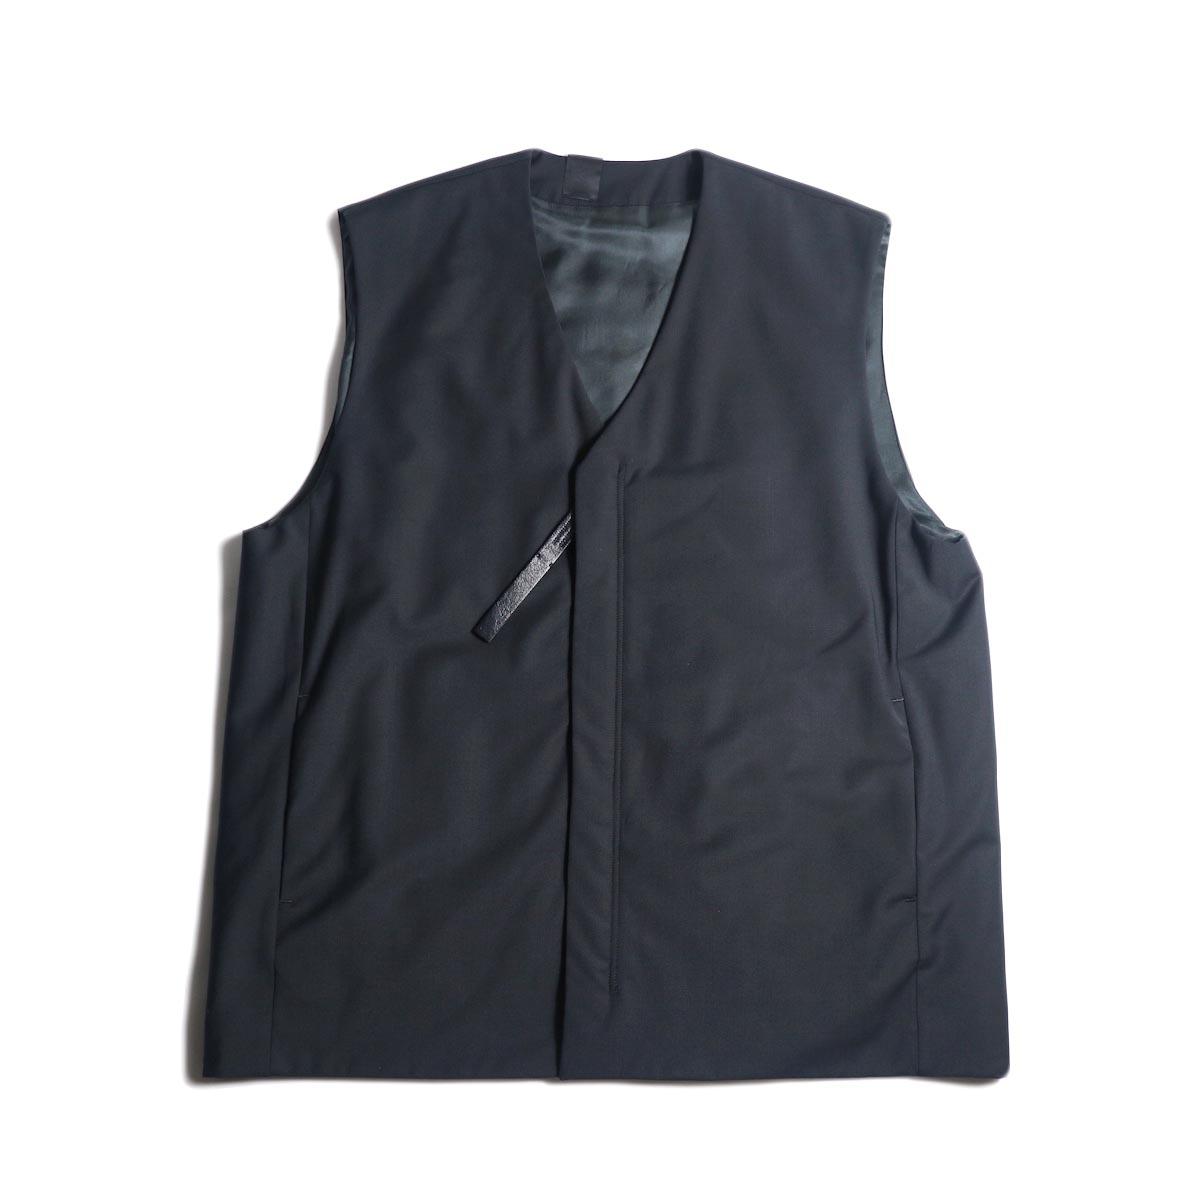 N.HOOLYWOOD / 2202-VE03-002 Vest (Black)